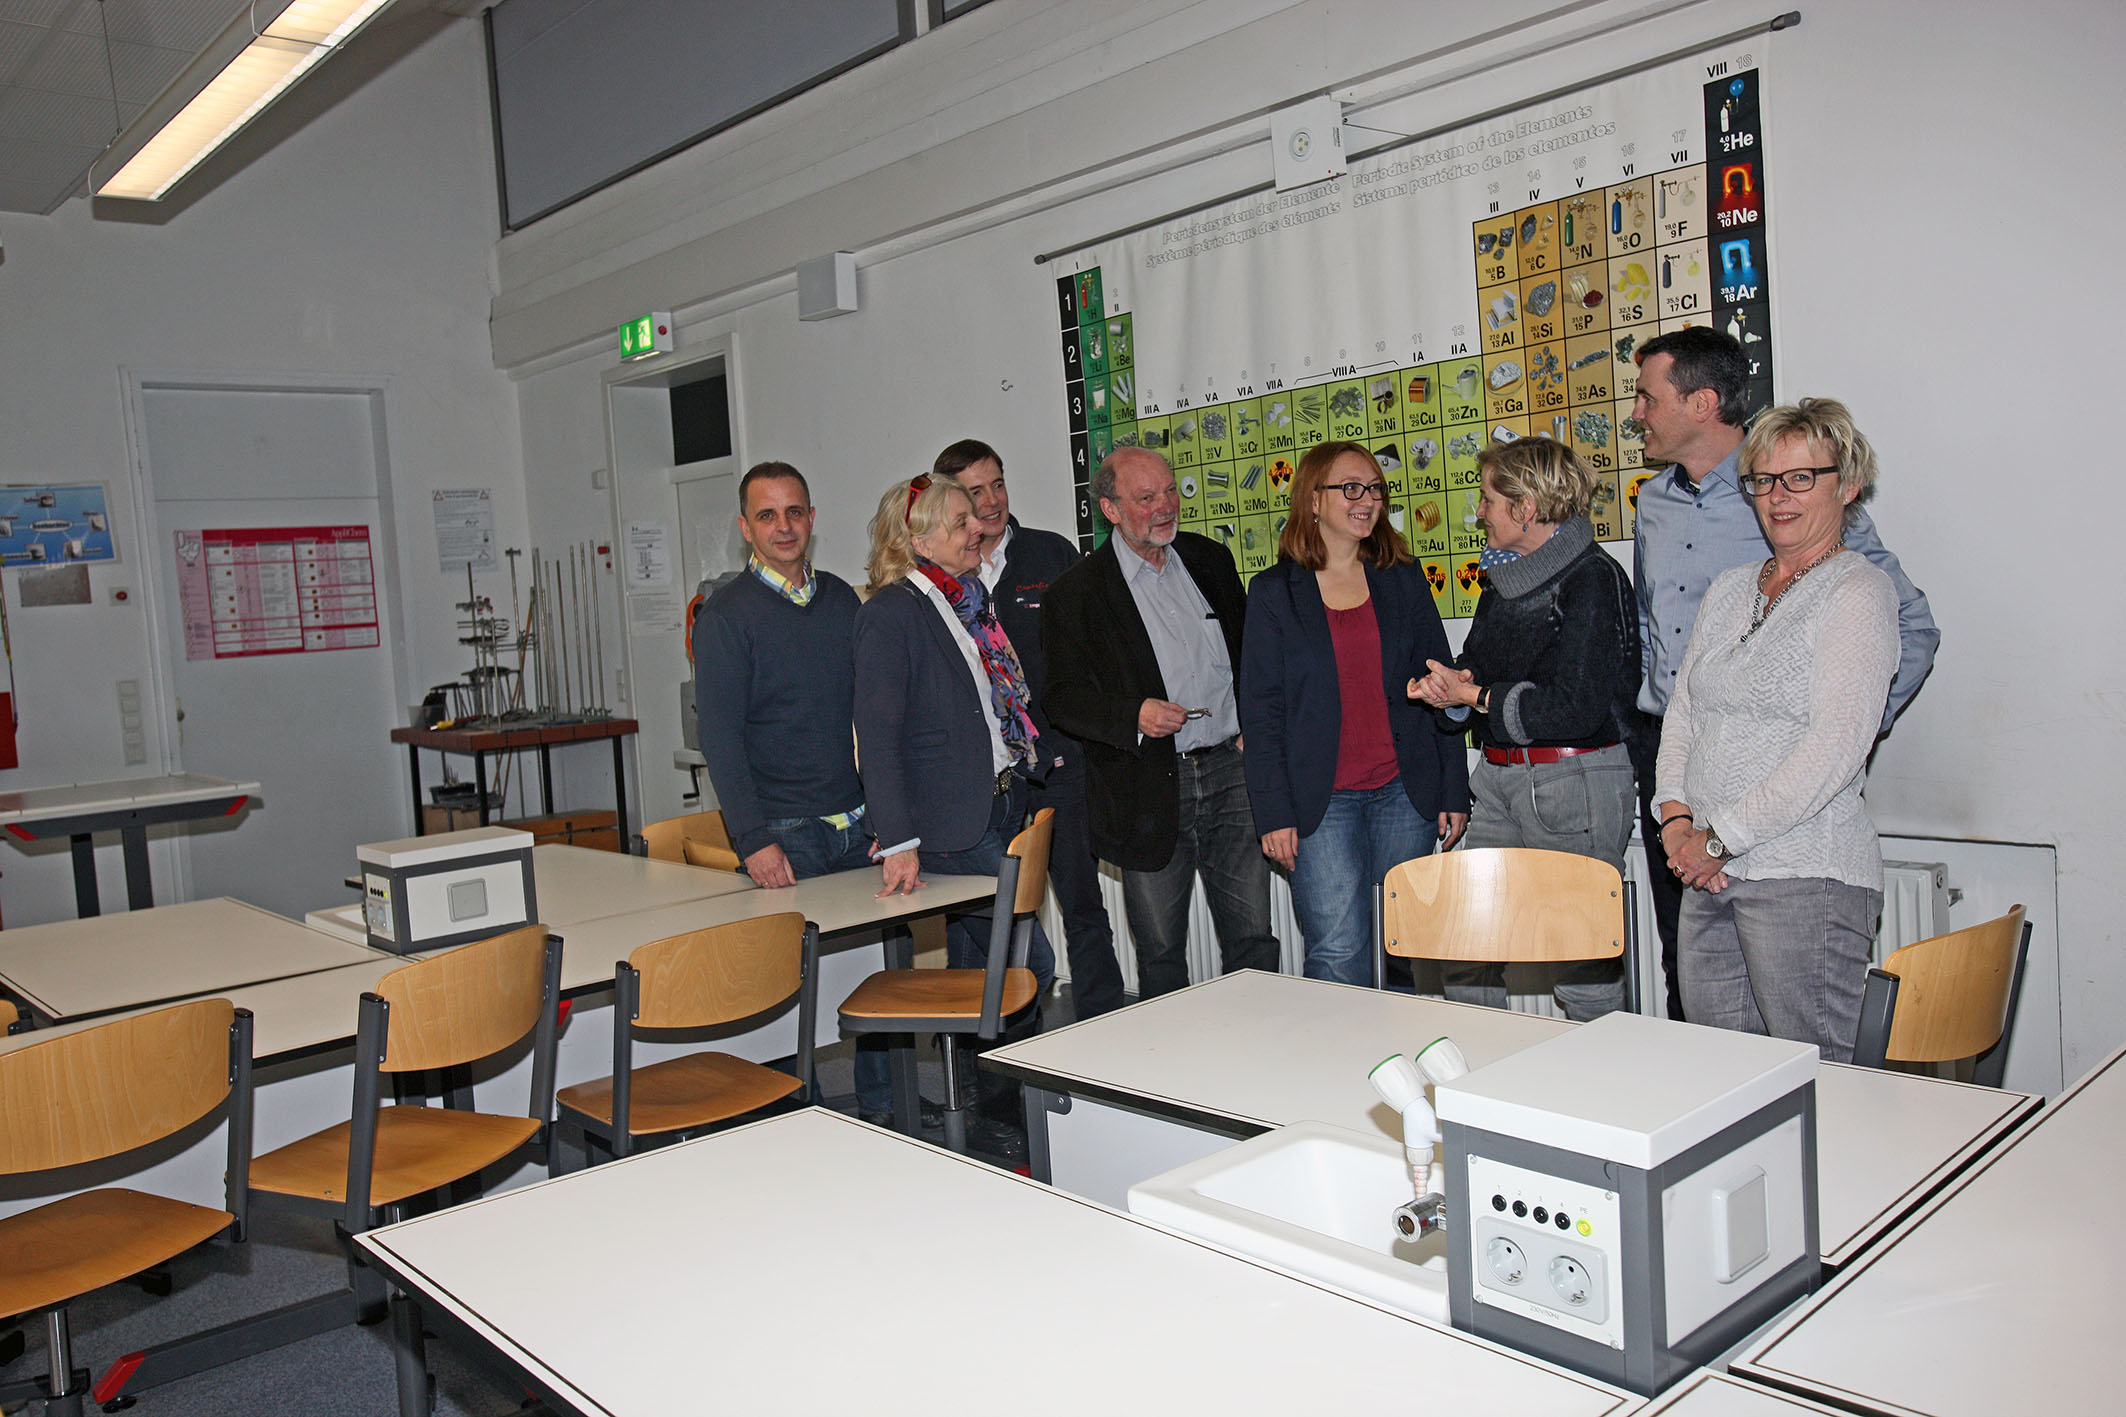 CDU-Kreisverband Worms-Stadt - AG Bildung der CDU Worms lobt ...